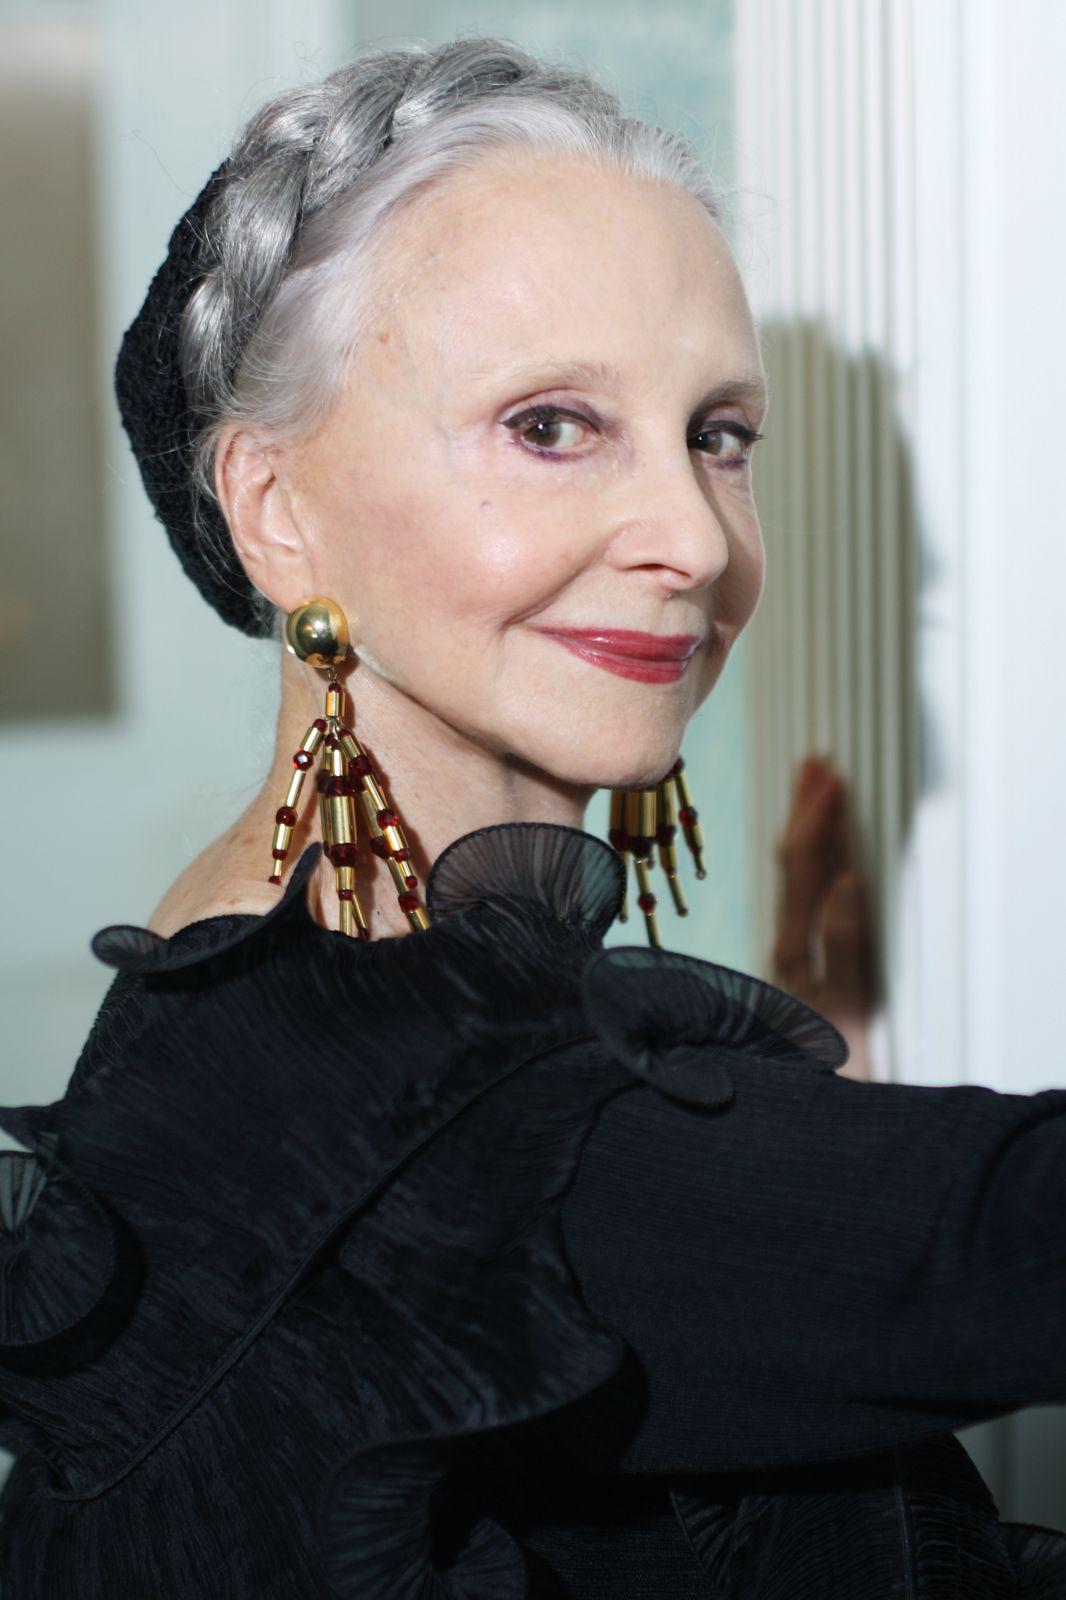 Advanced Style - Fashionable Senior Citizens